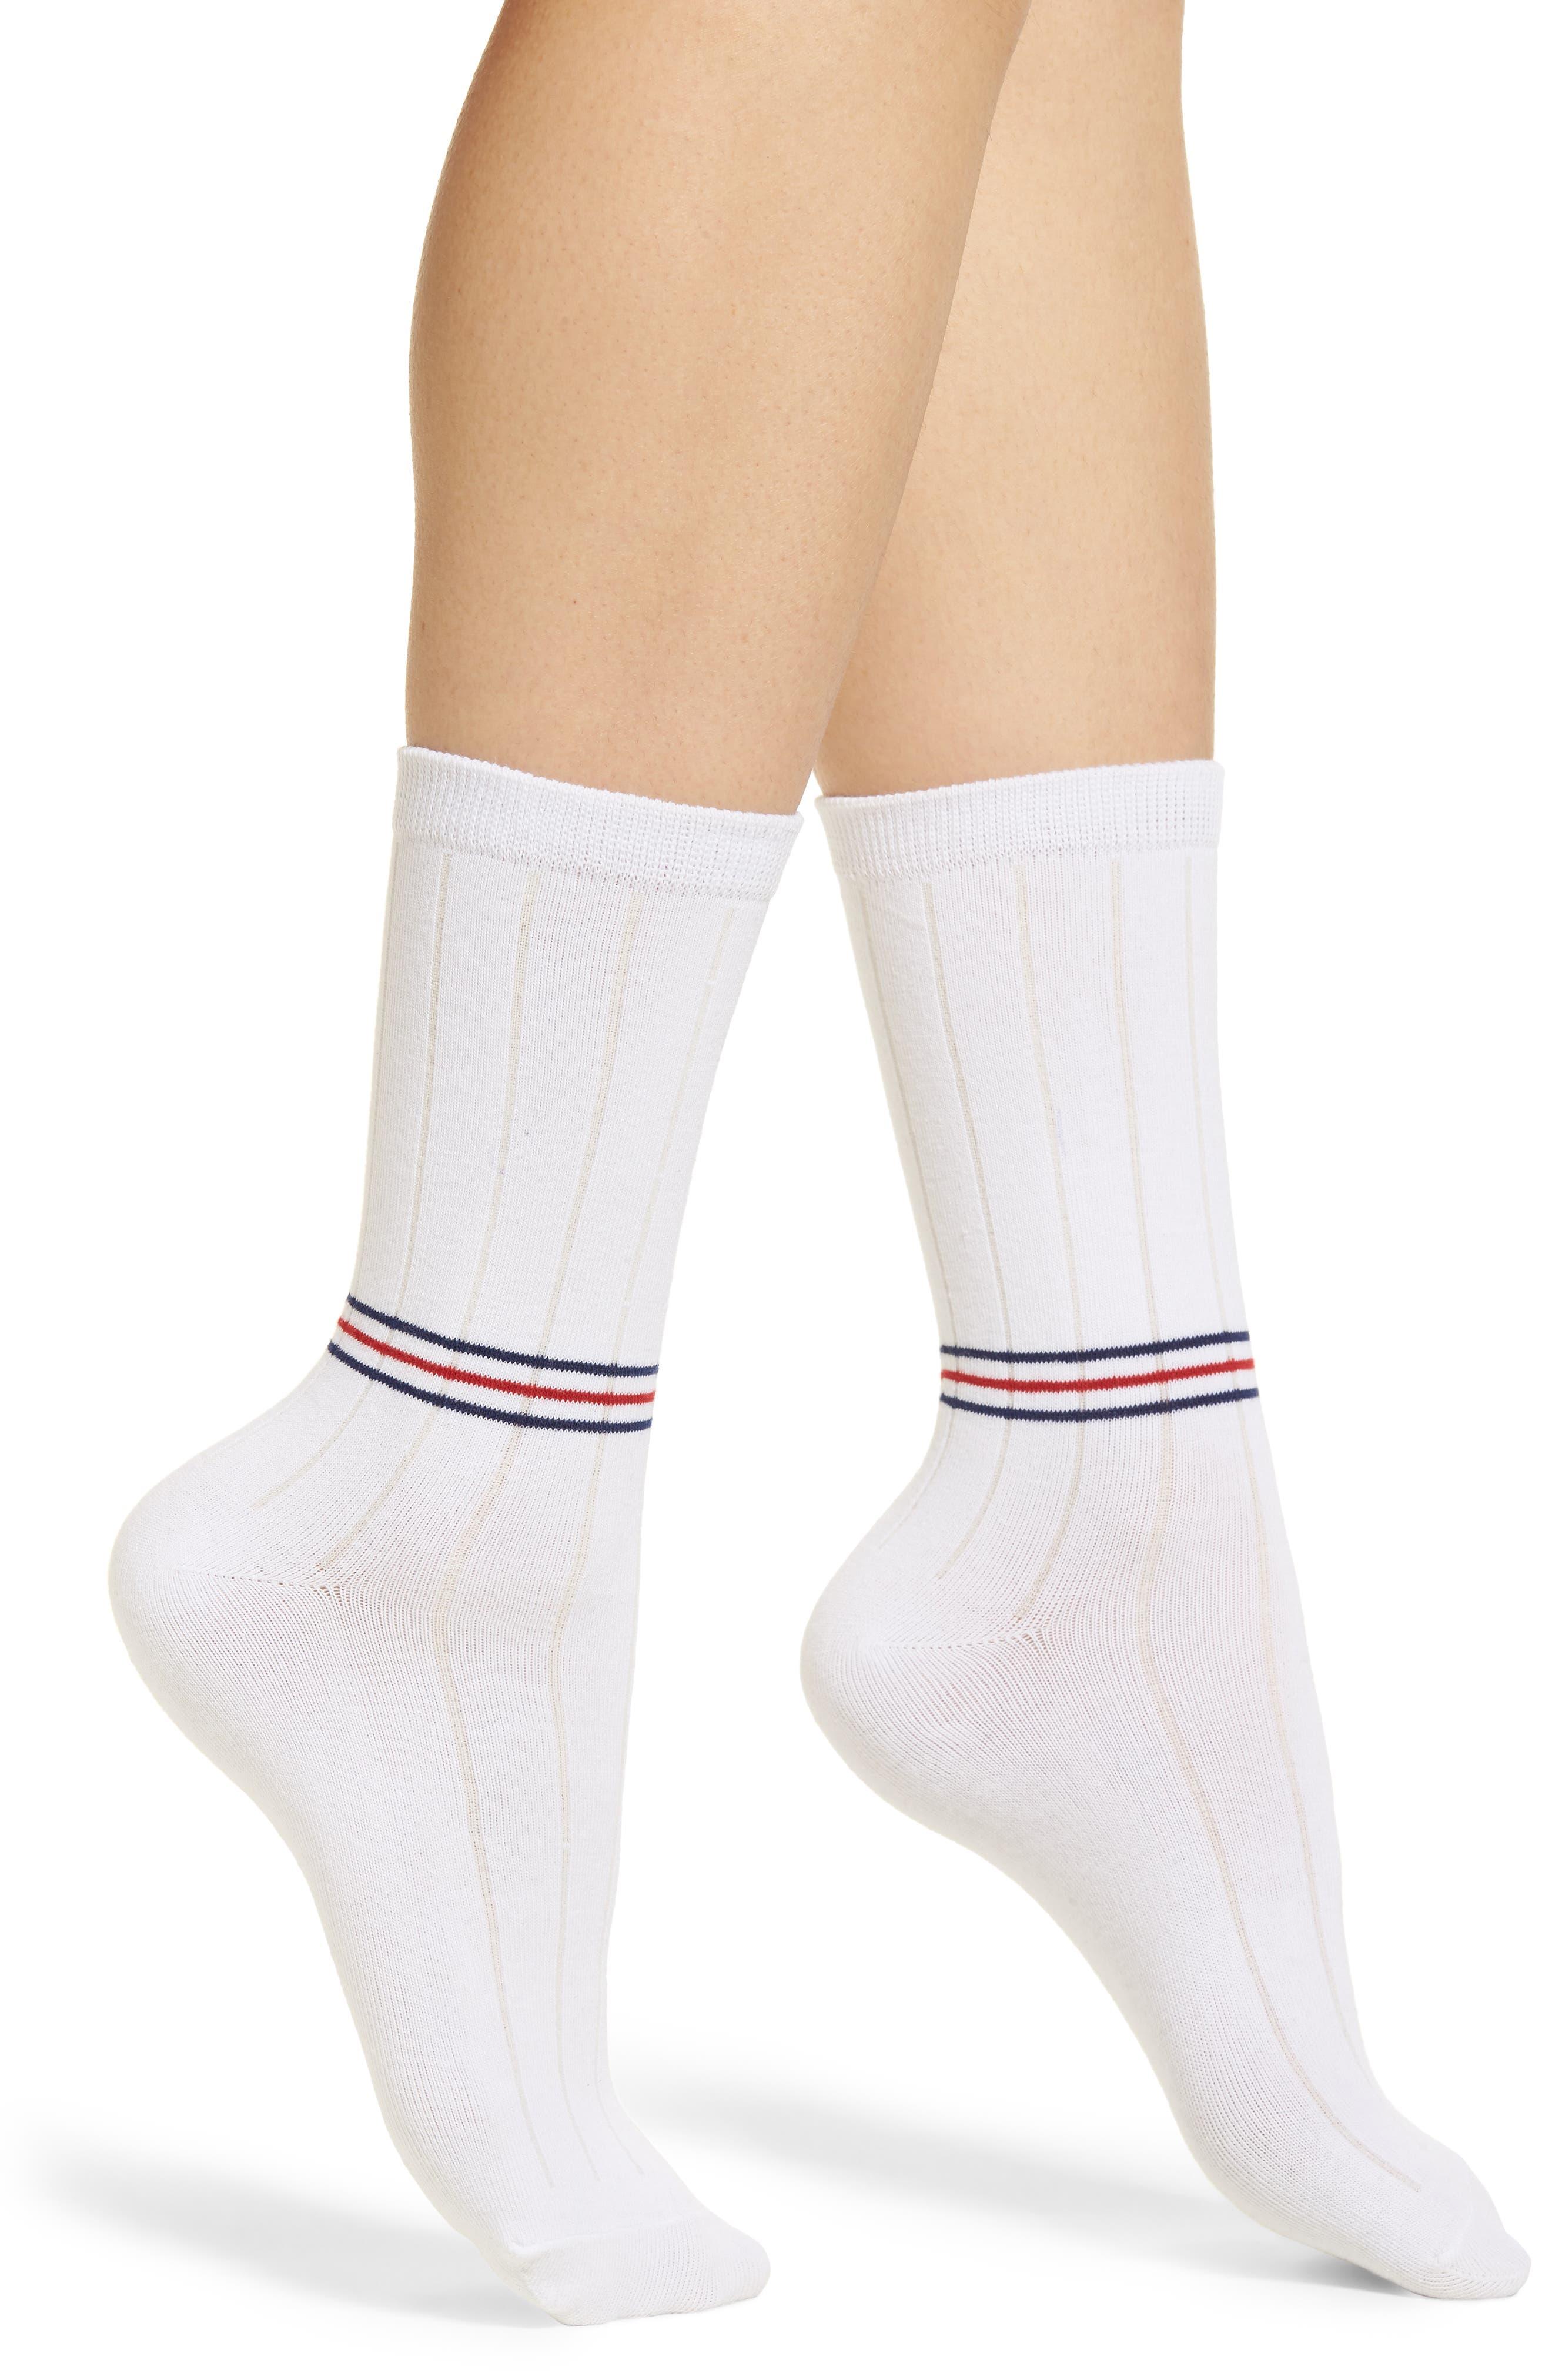 Rocky Classic Crew Socks,                         Main,                         color, White